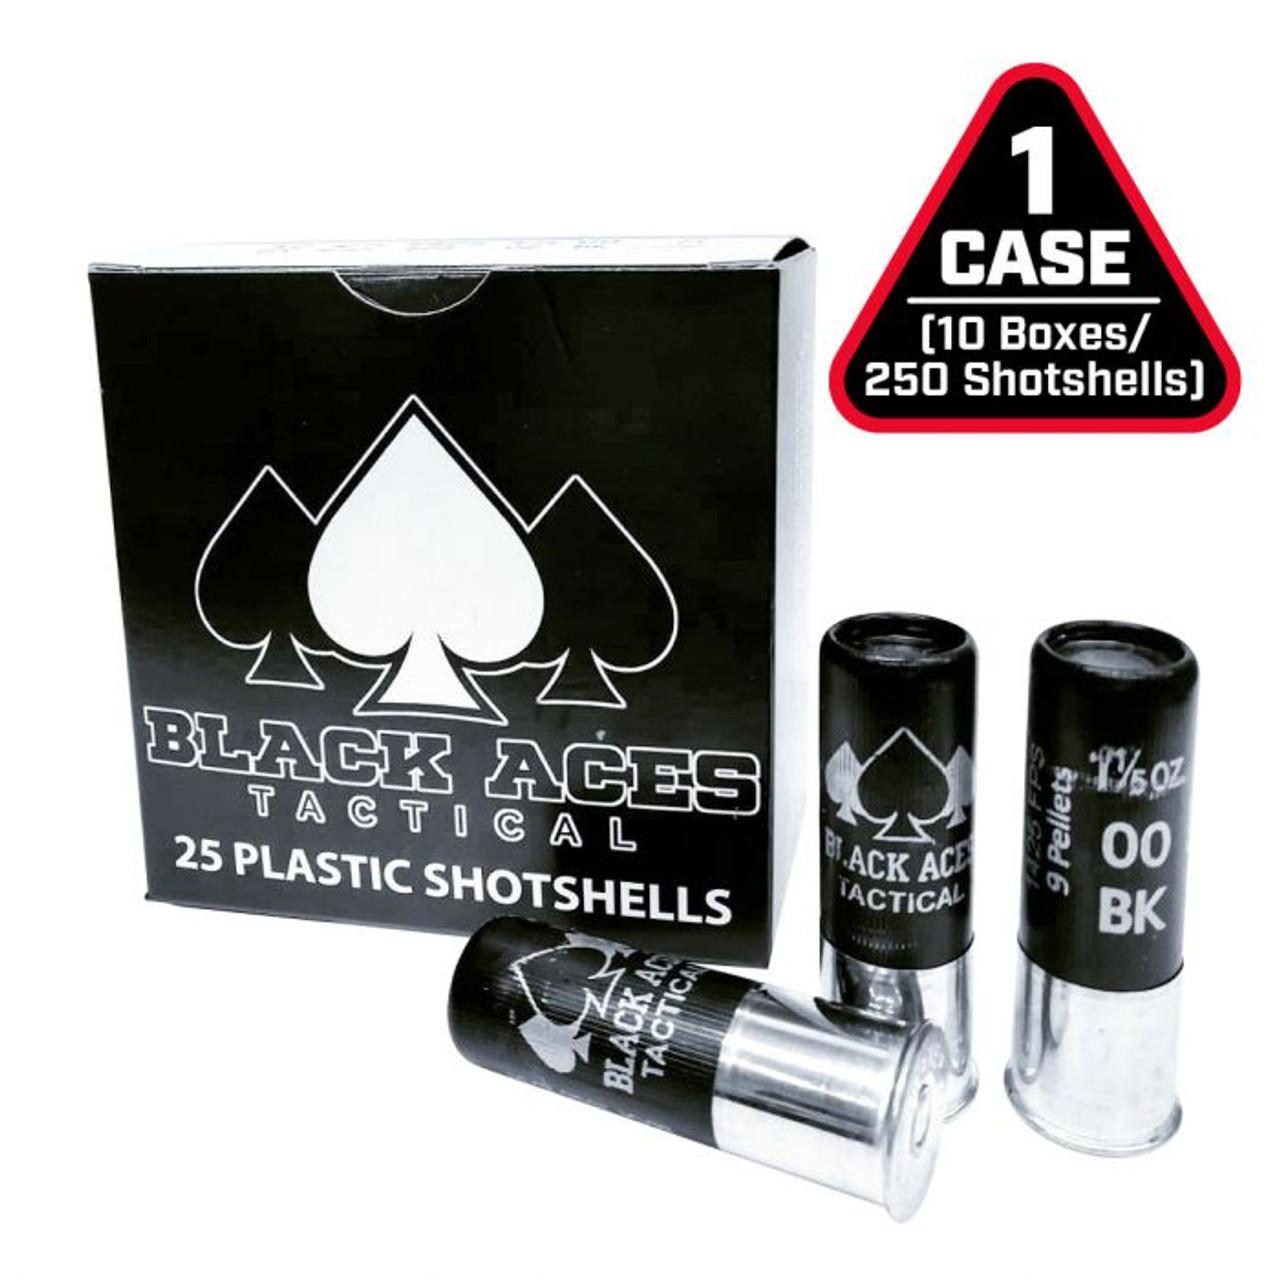 Black Aces Tactical 12ga 2 3/4'' 00 Buck -250rds